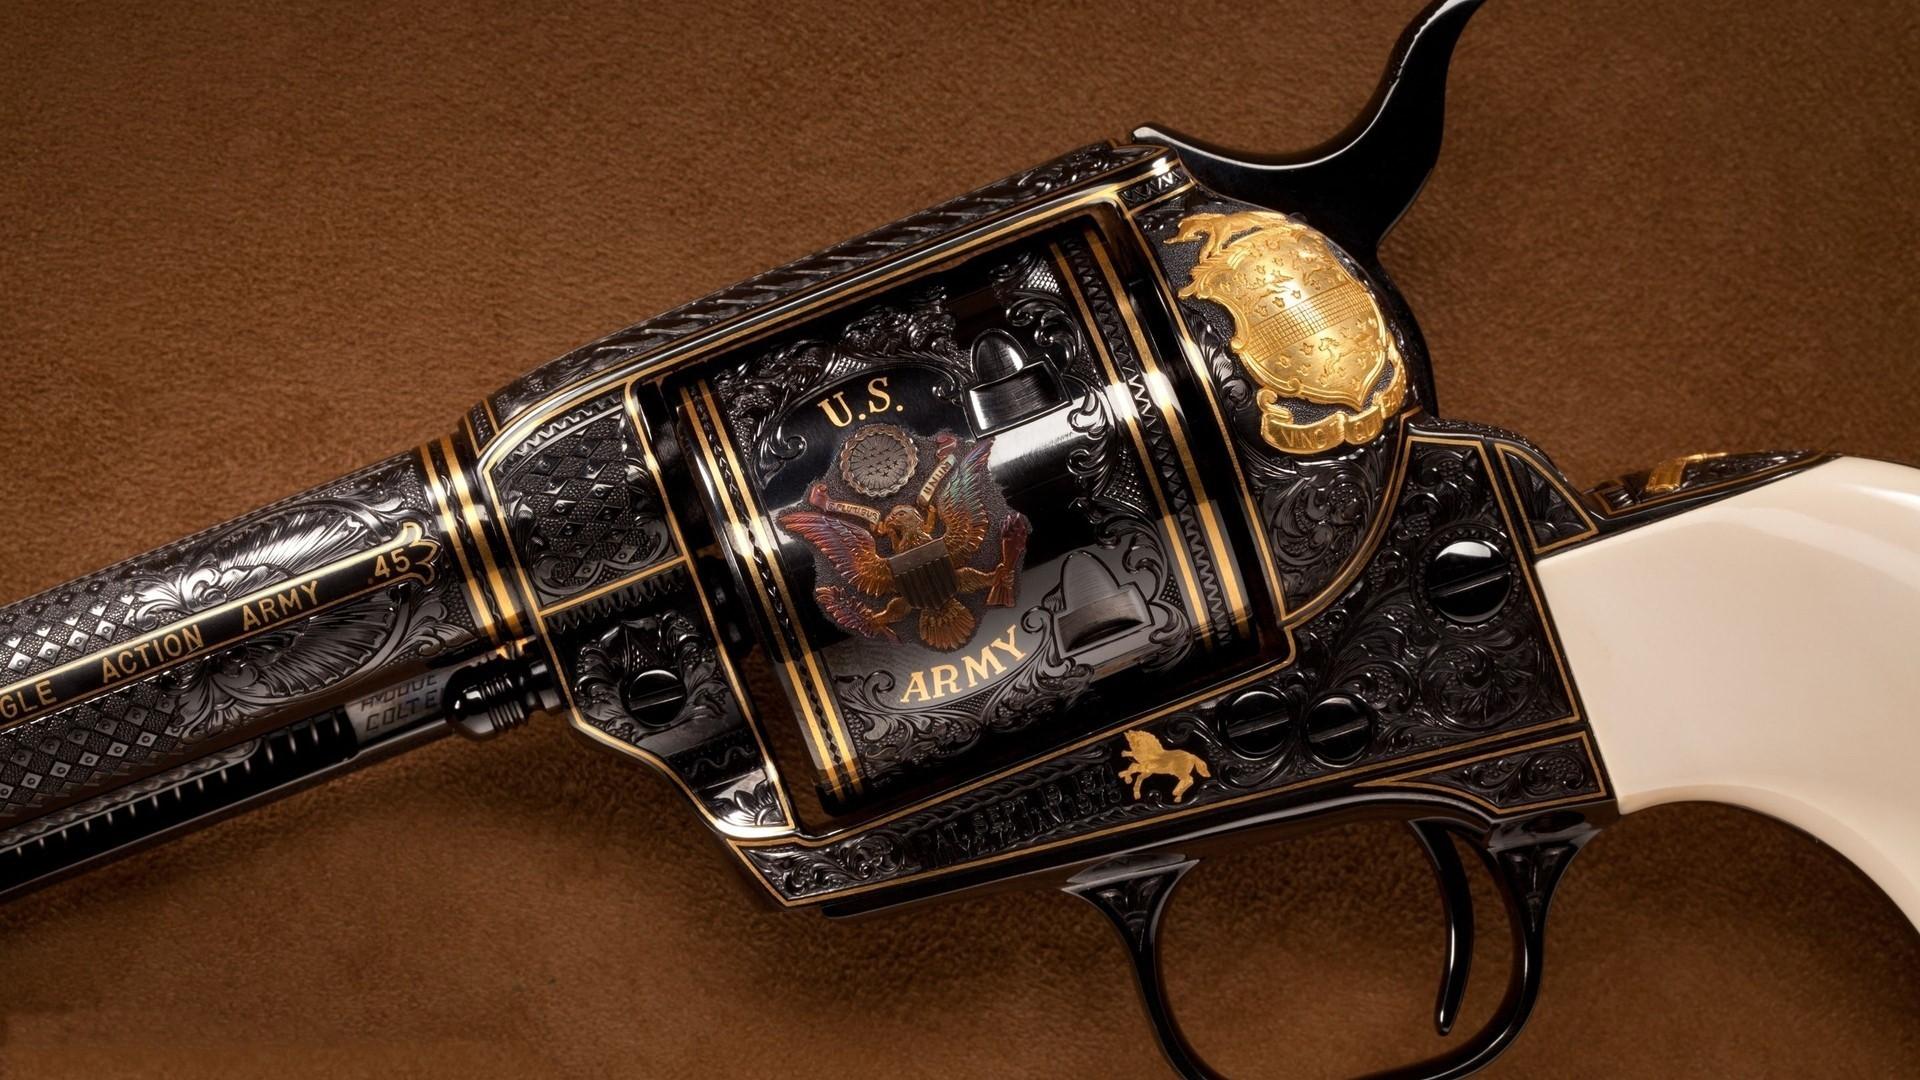 Springfield Armory HD Gun Weapons Photo